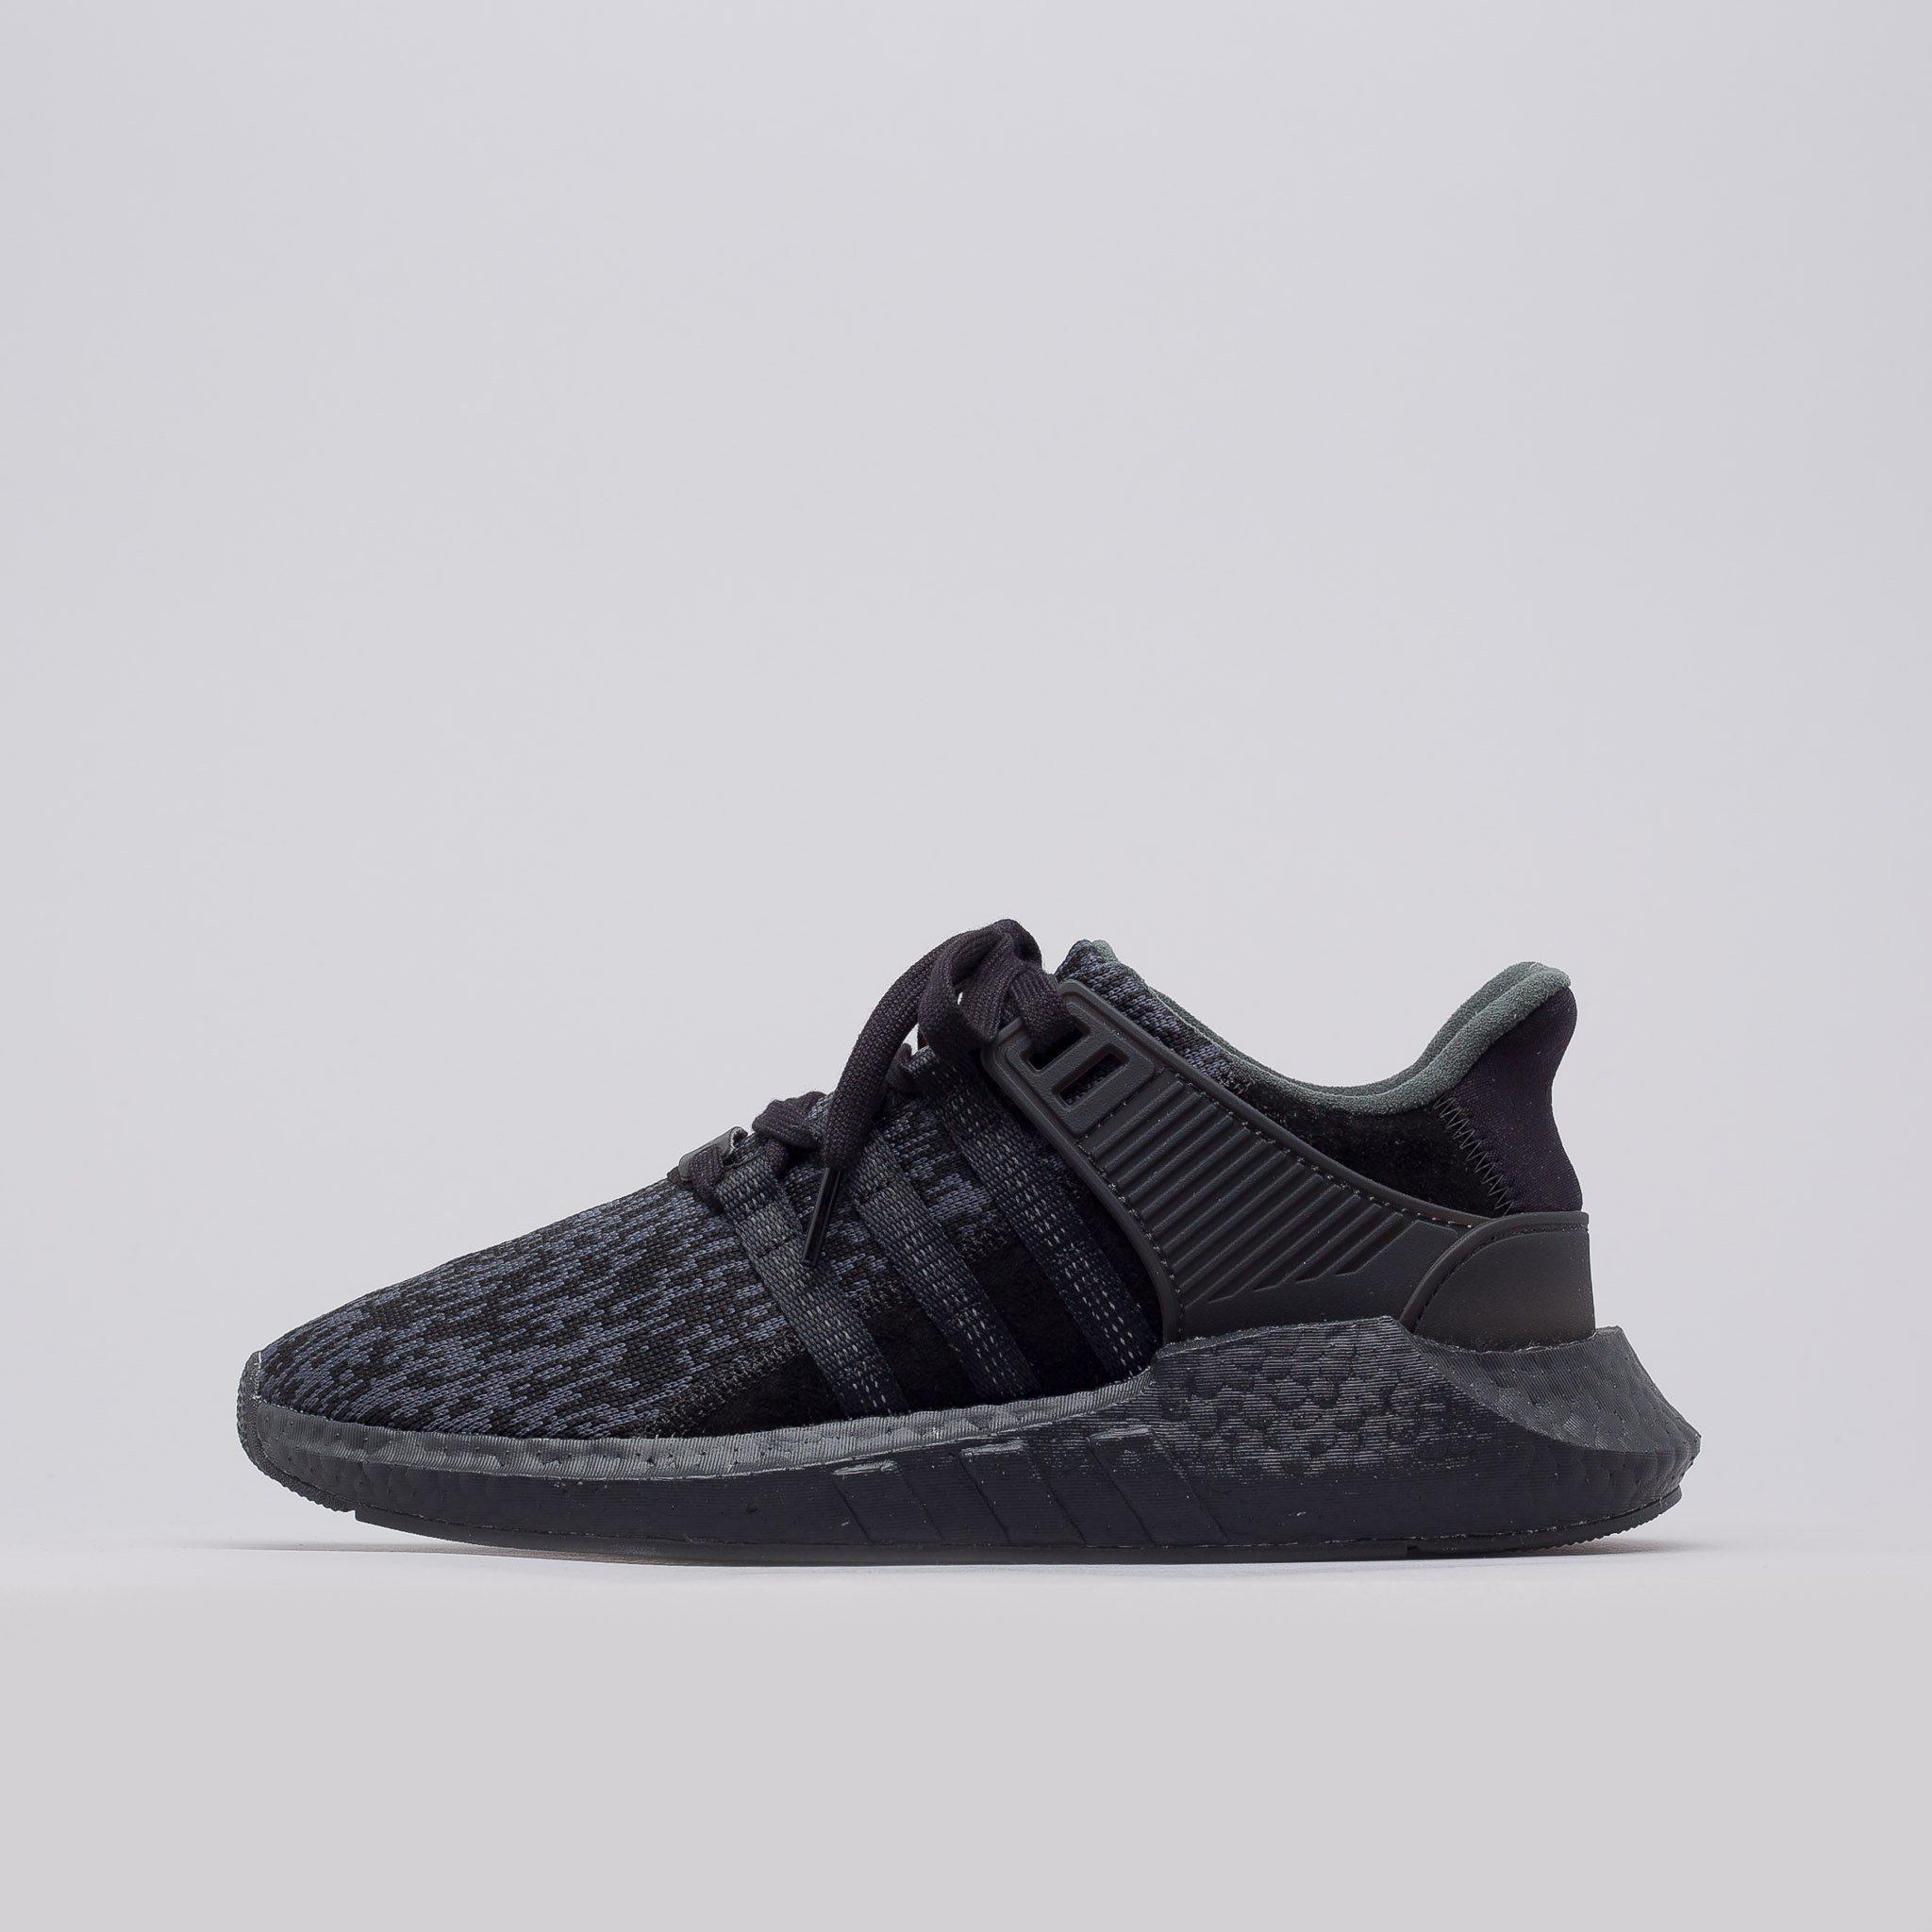 a92b5630d9e5 Lyst - adidas Eqt Support 93 17 Triple Black in Black for Men